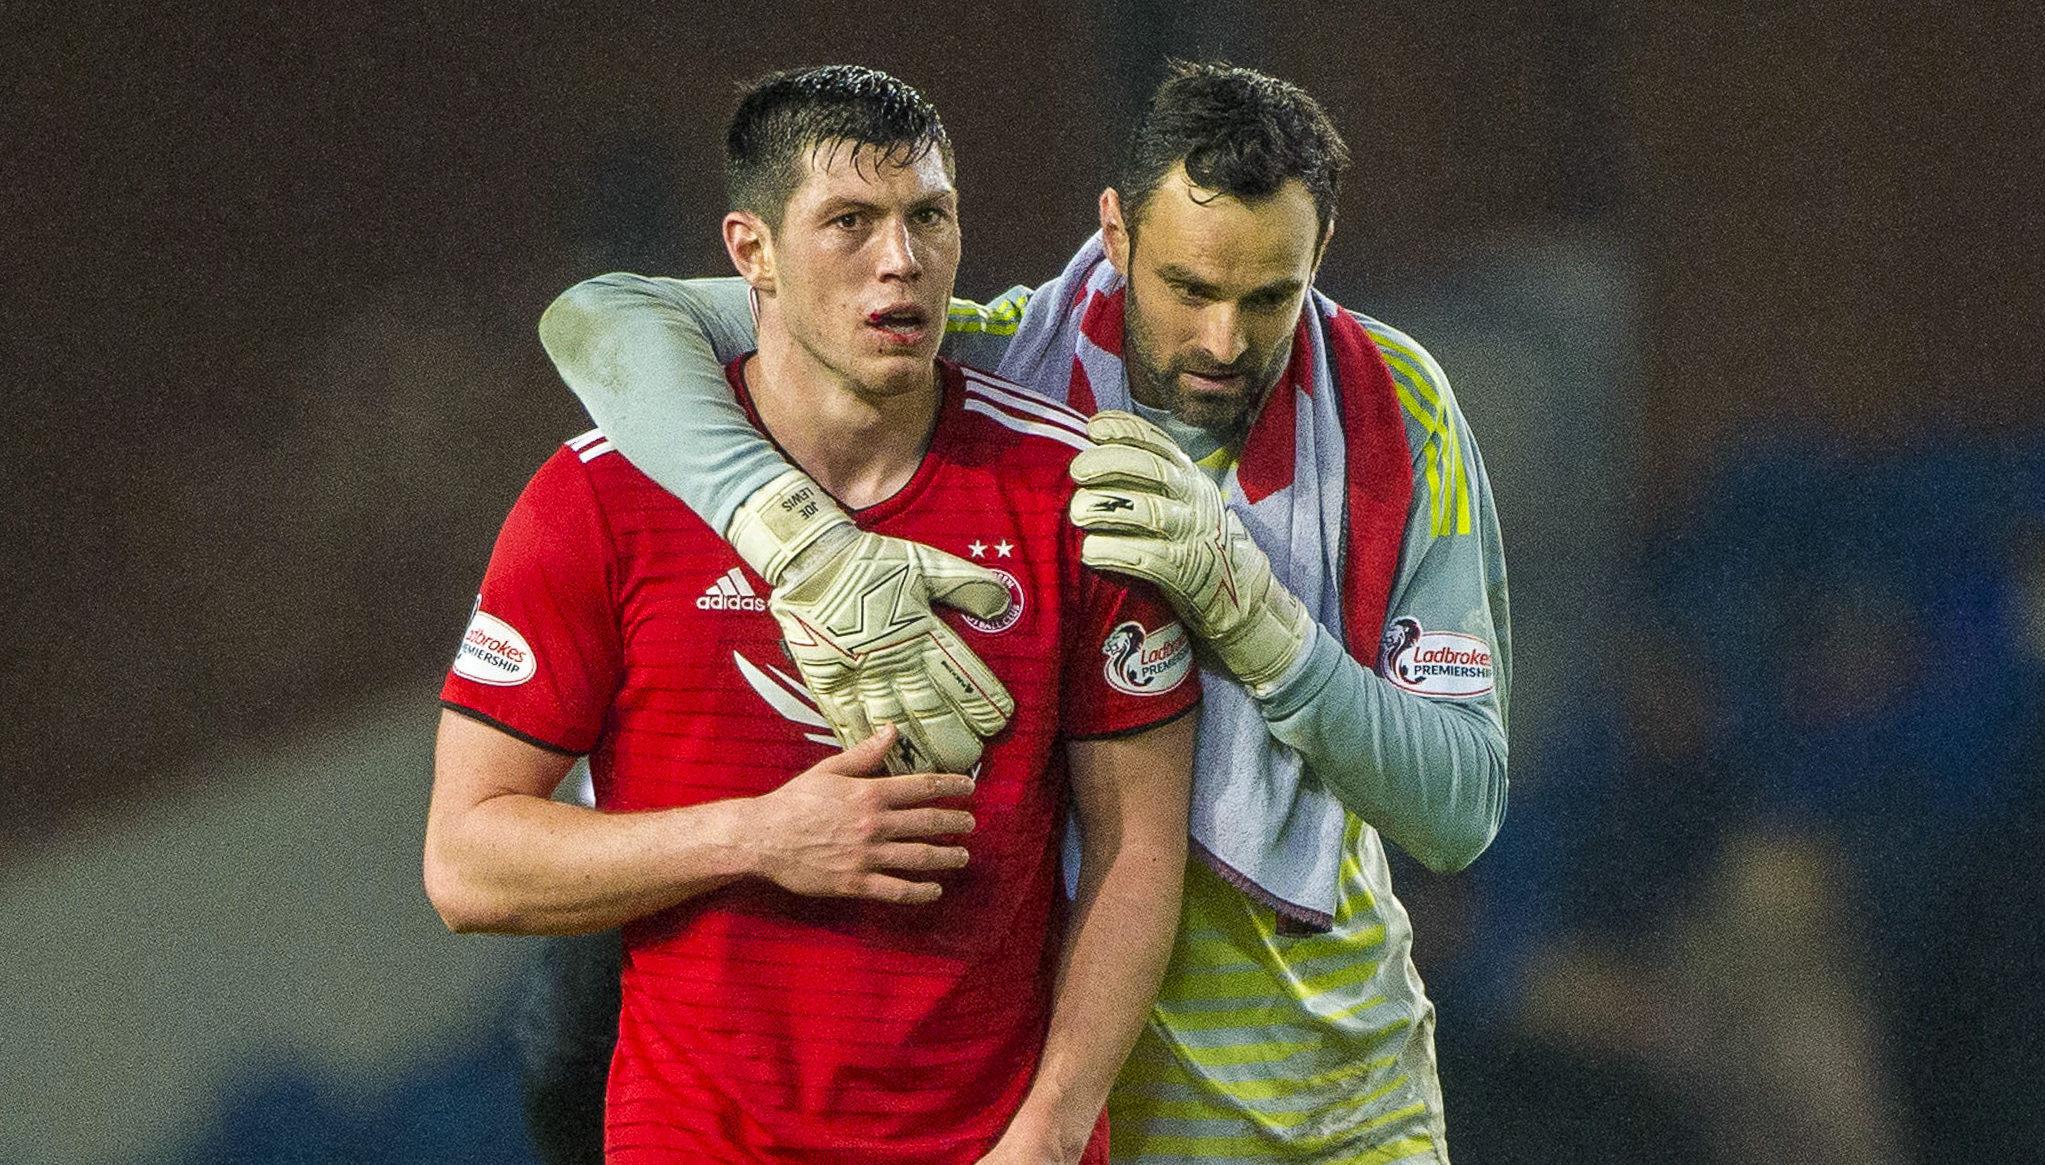 Aberdeen's Scott McKenna and goalkeeper Joe Lewis at full time